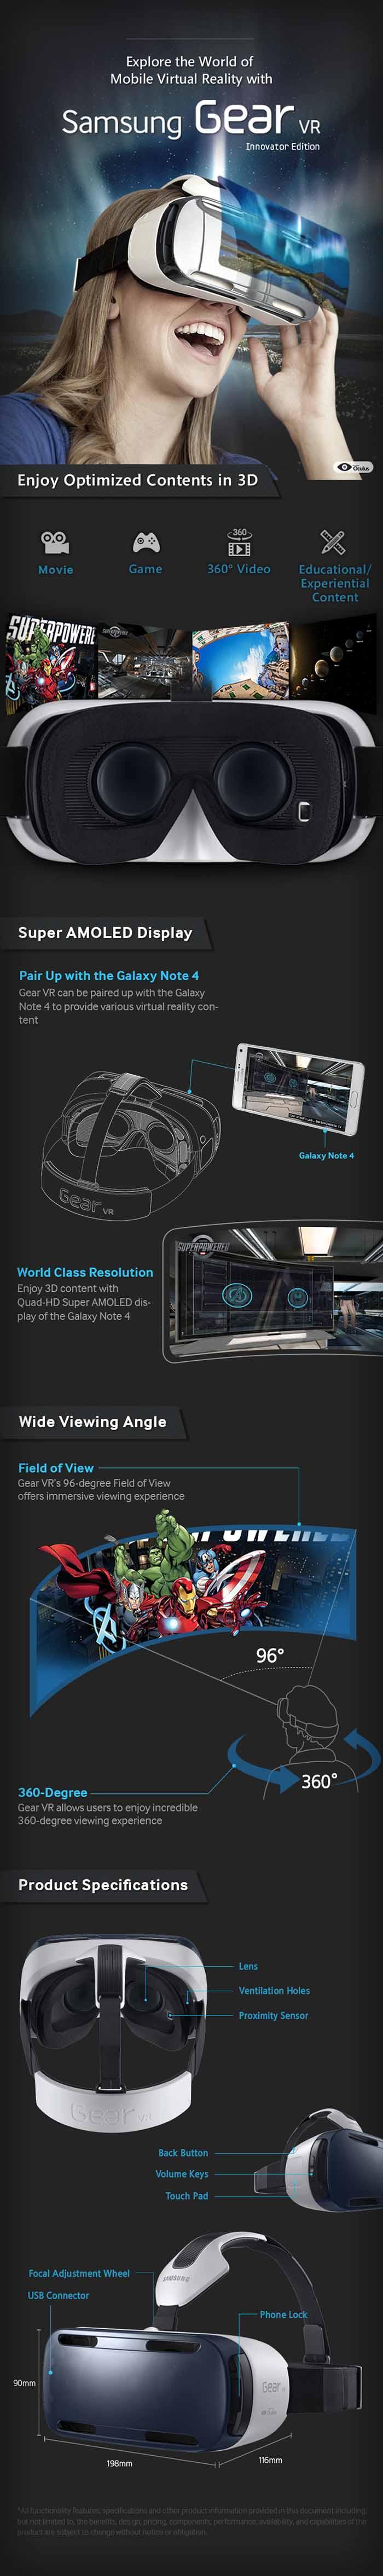 Samsung Galaxy Gear VR (Realidad Virtual)